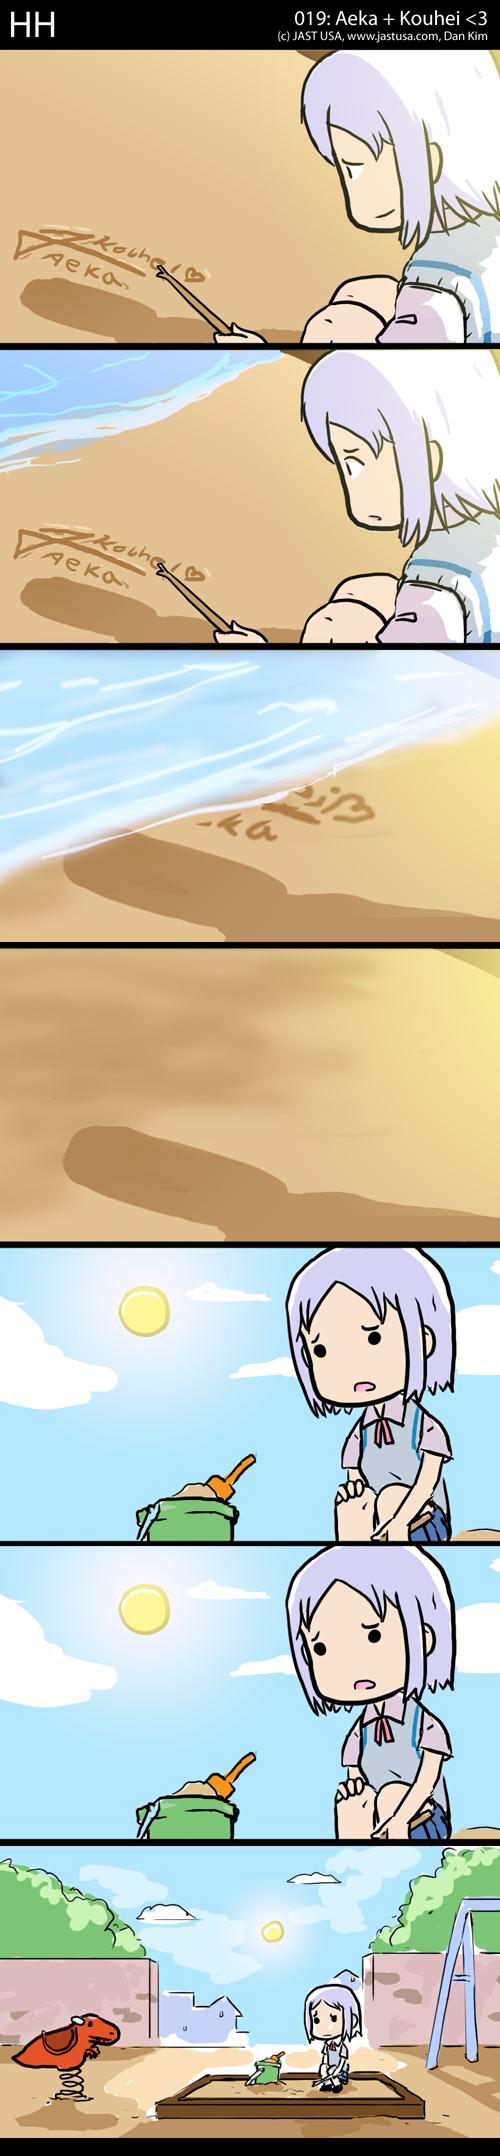 [HH - strip 19]